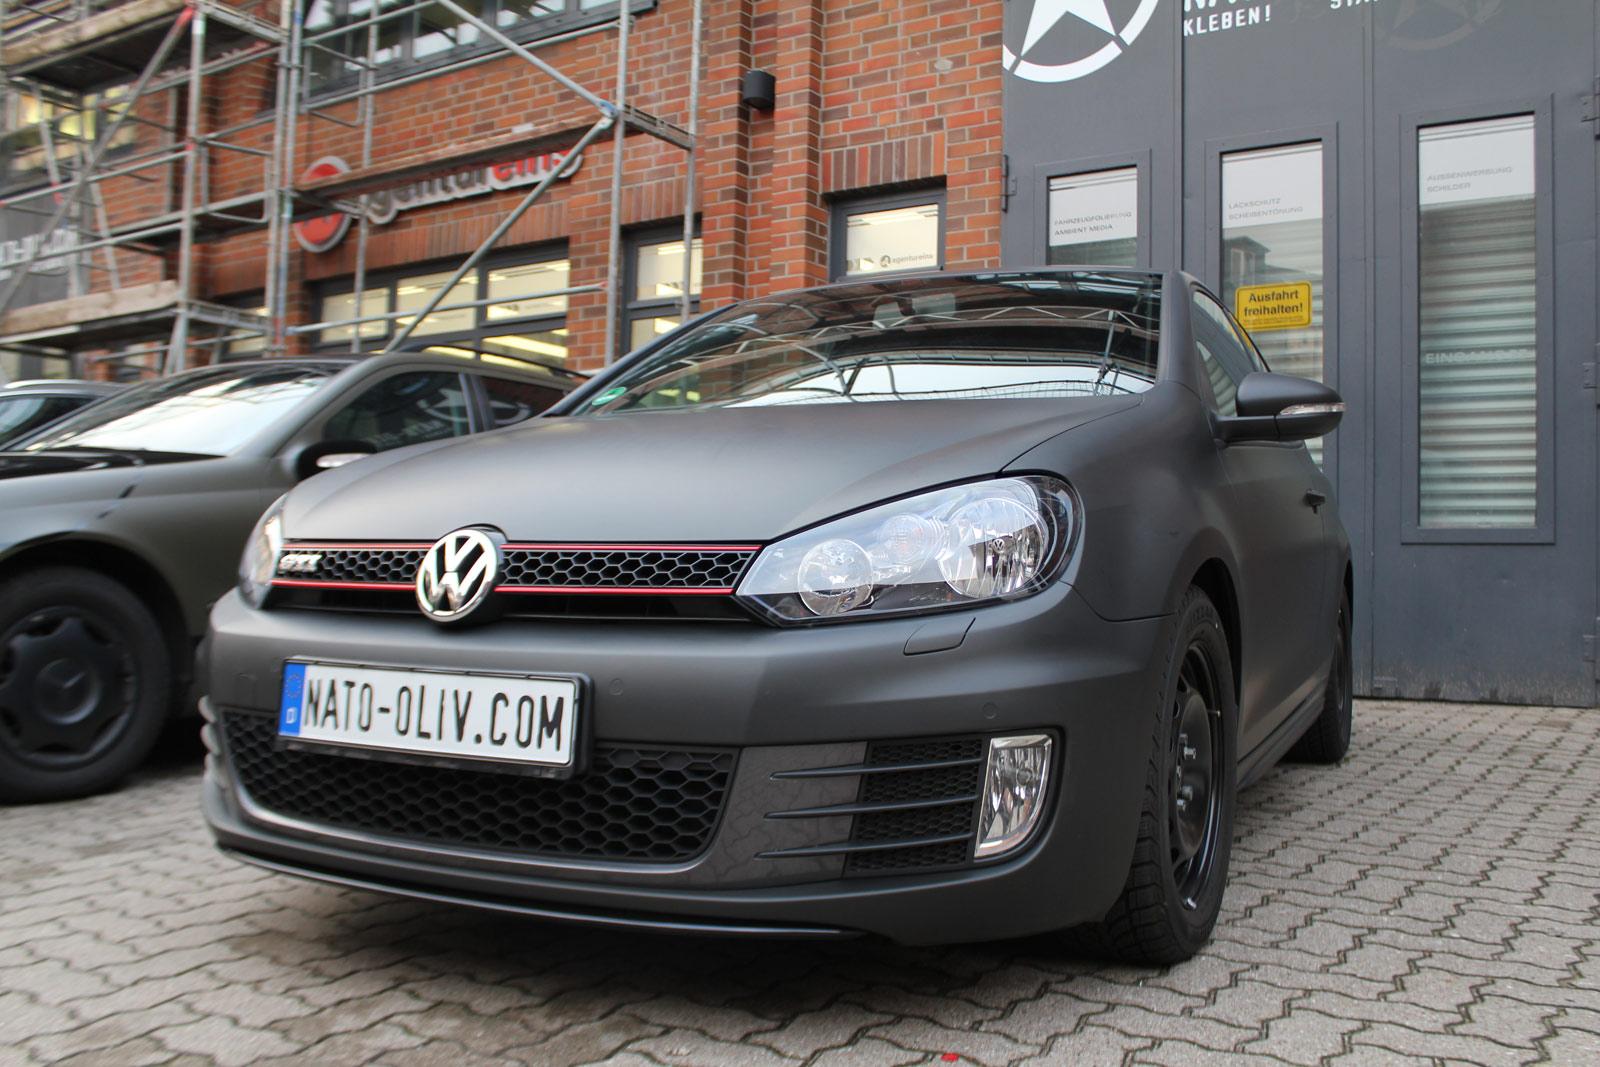 VW_GOLF_GTI_SCHWARZ_MATT_SCHEIBENTOENUNG_10